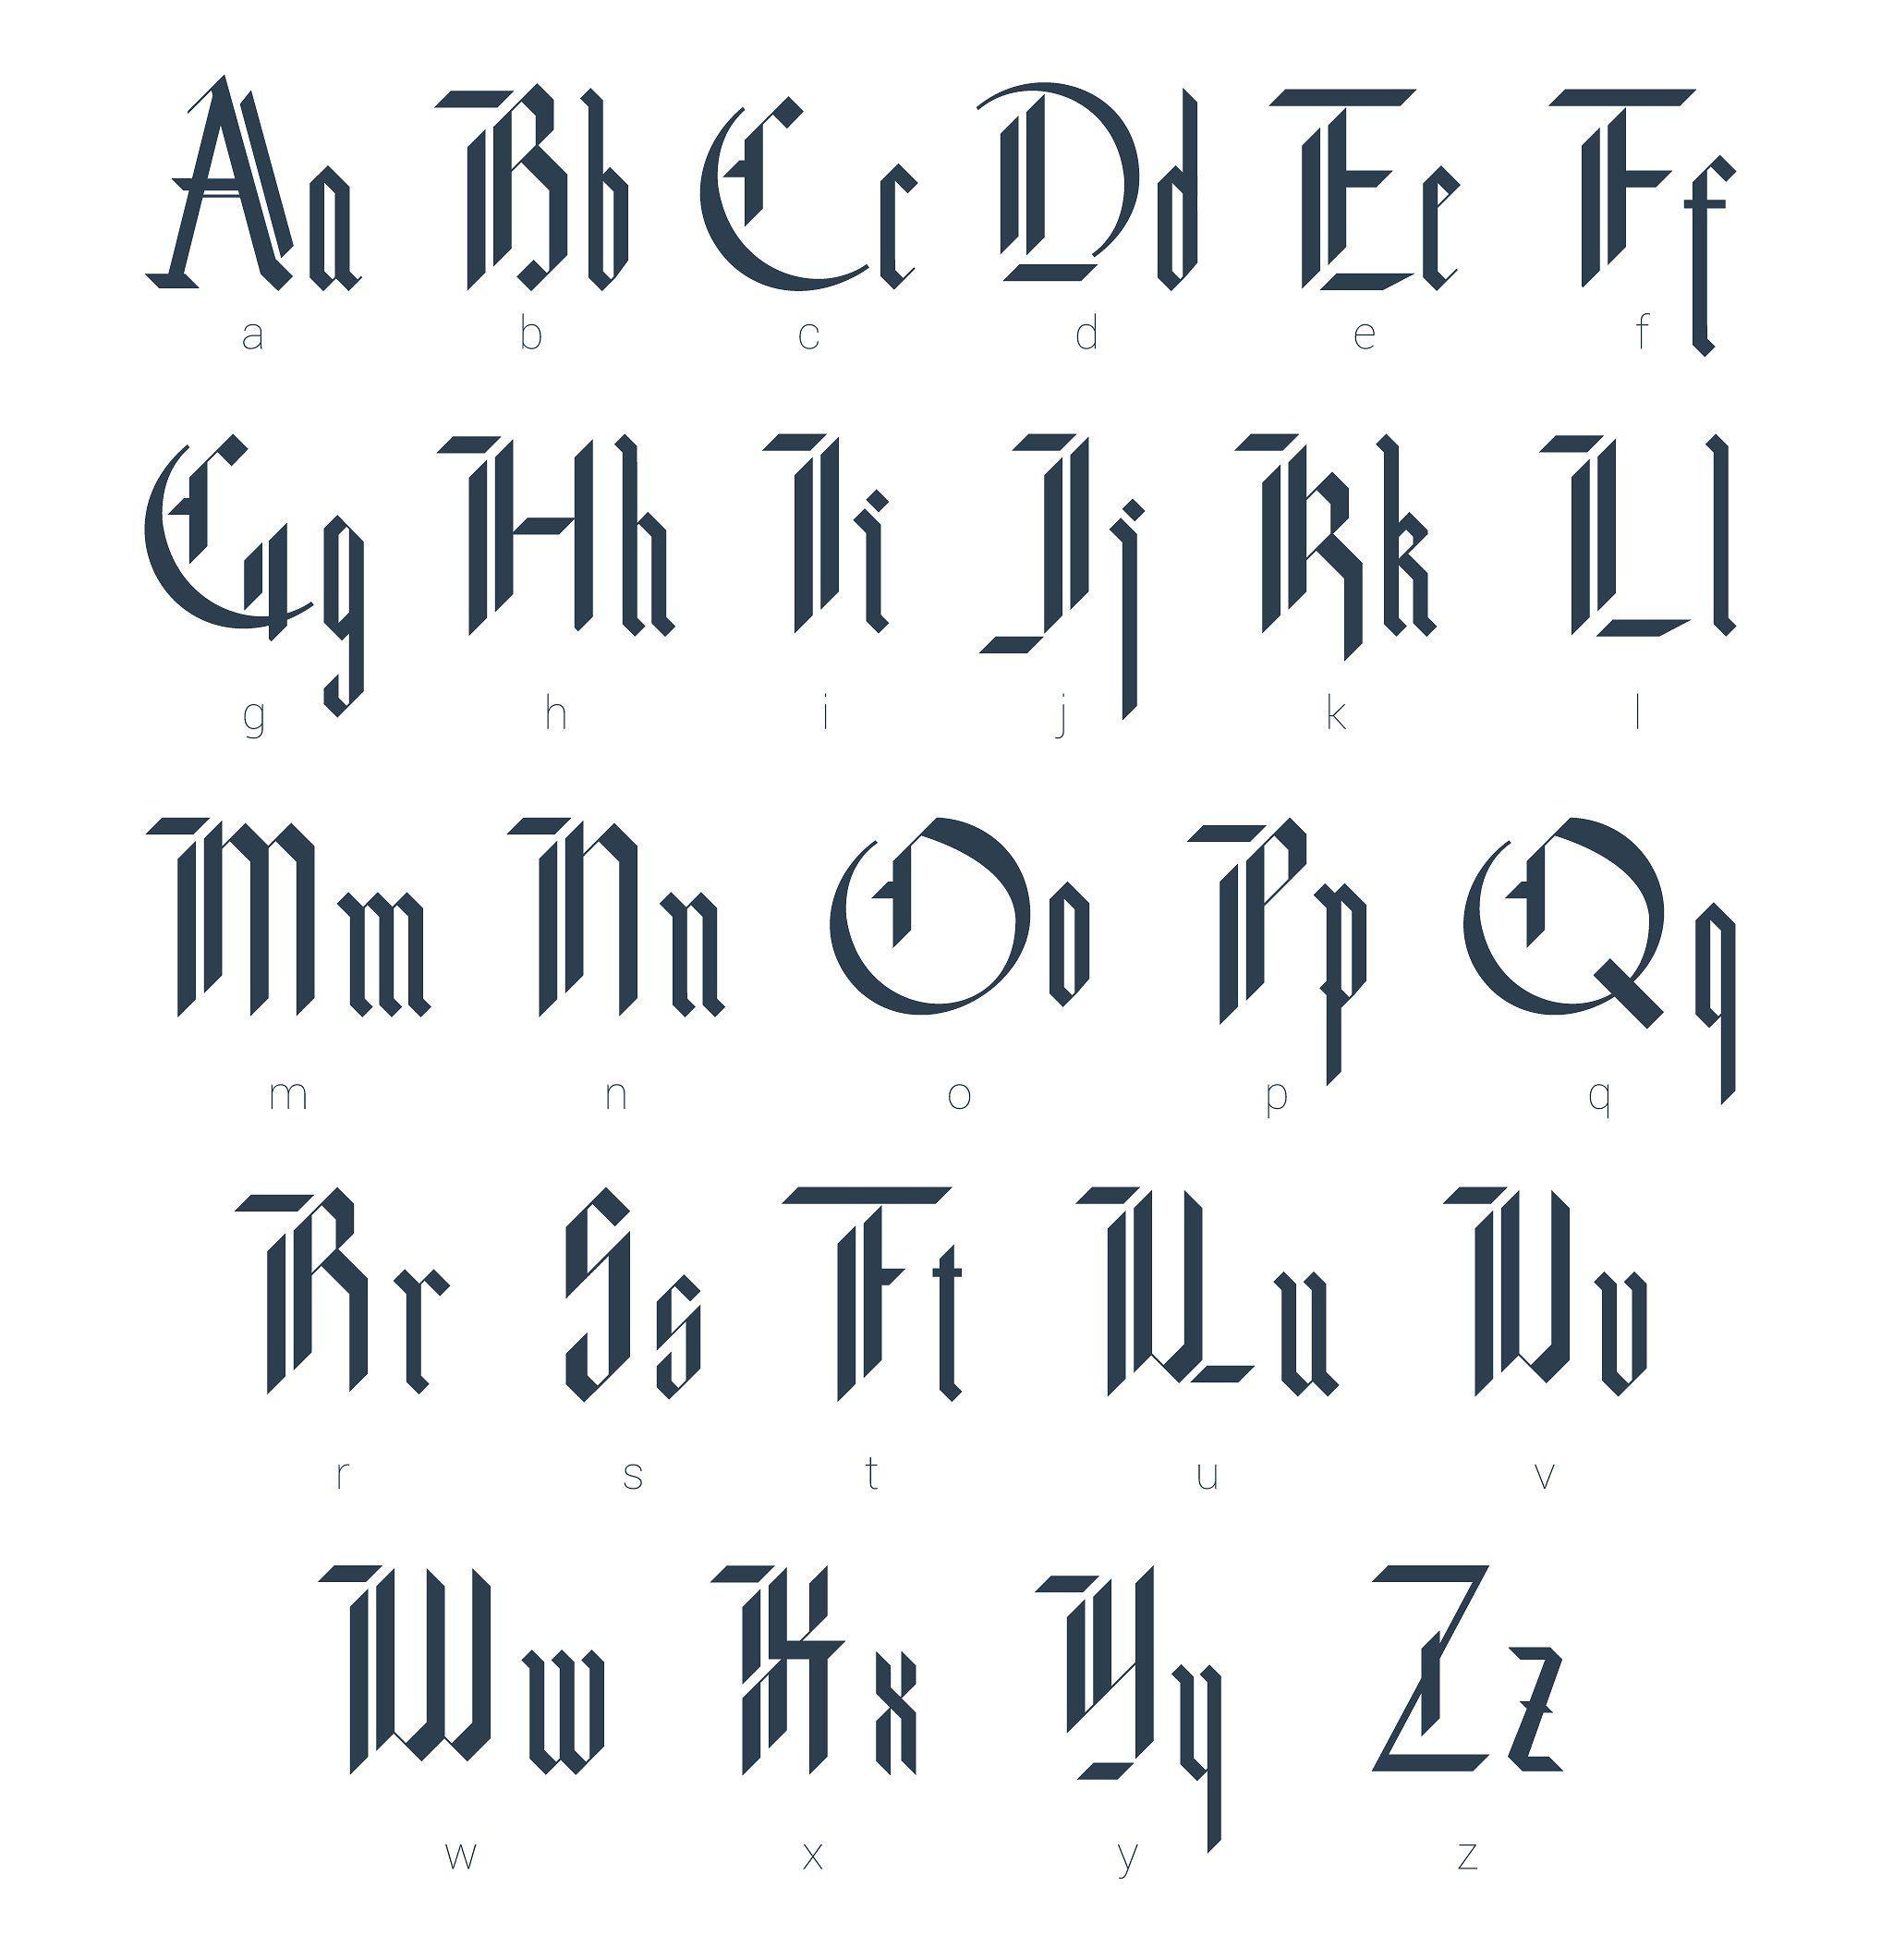 Blackletter Modern Gothic Font By Supermne On Creativemarket